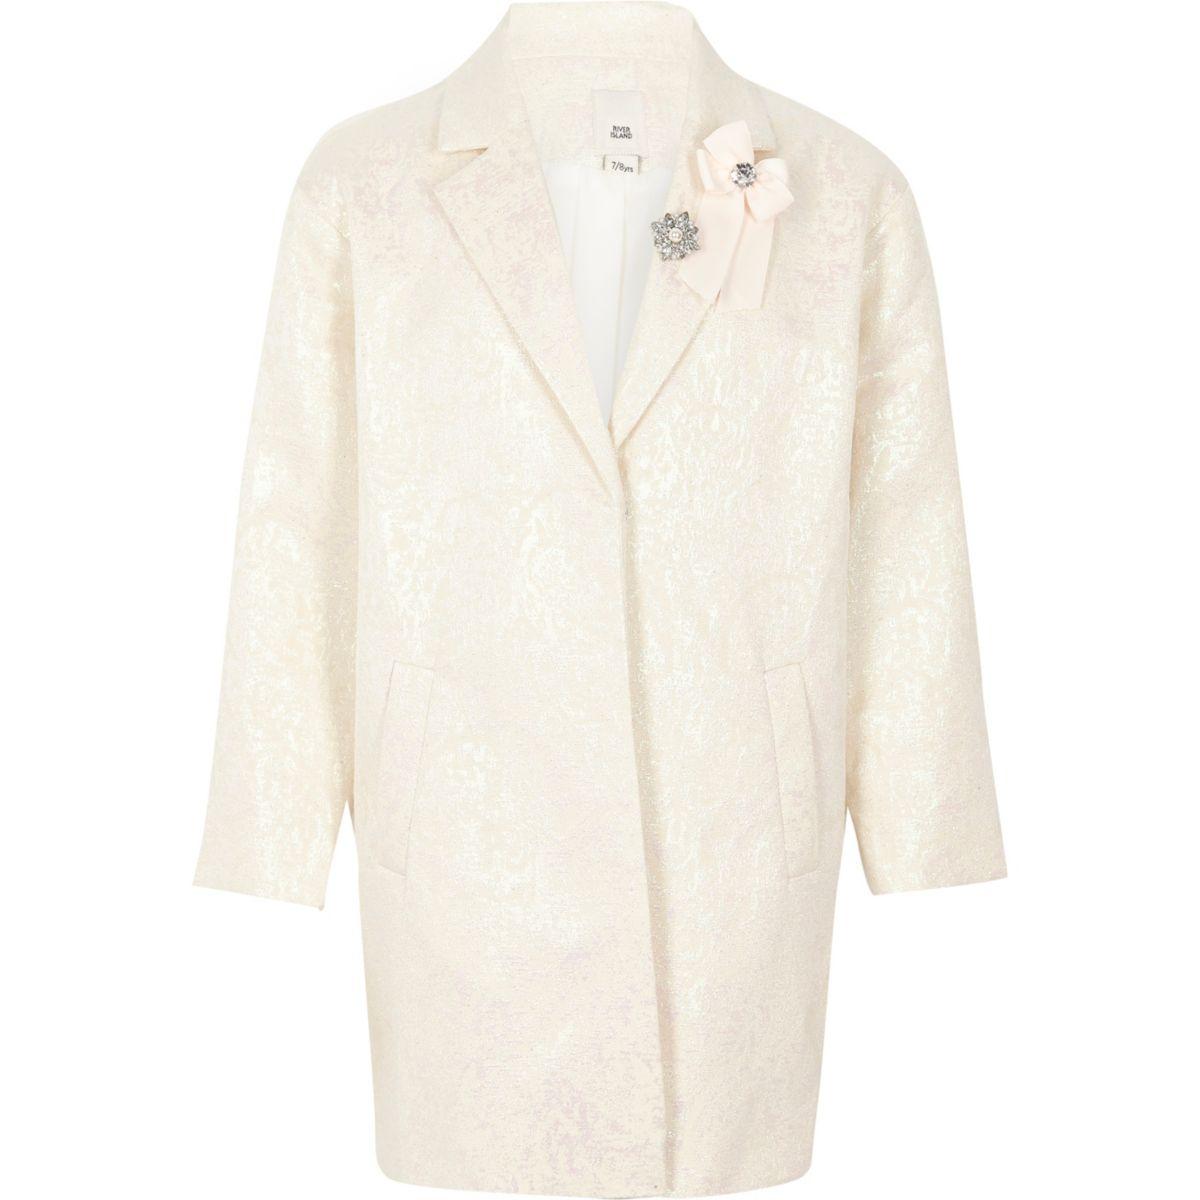 Girls white iridescent jacquard brooch coat